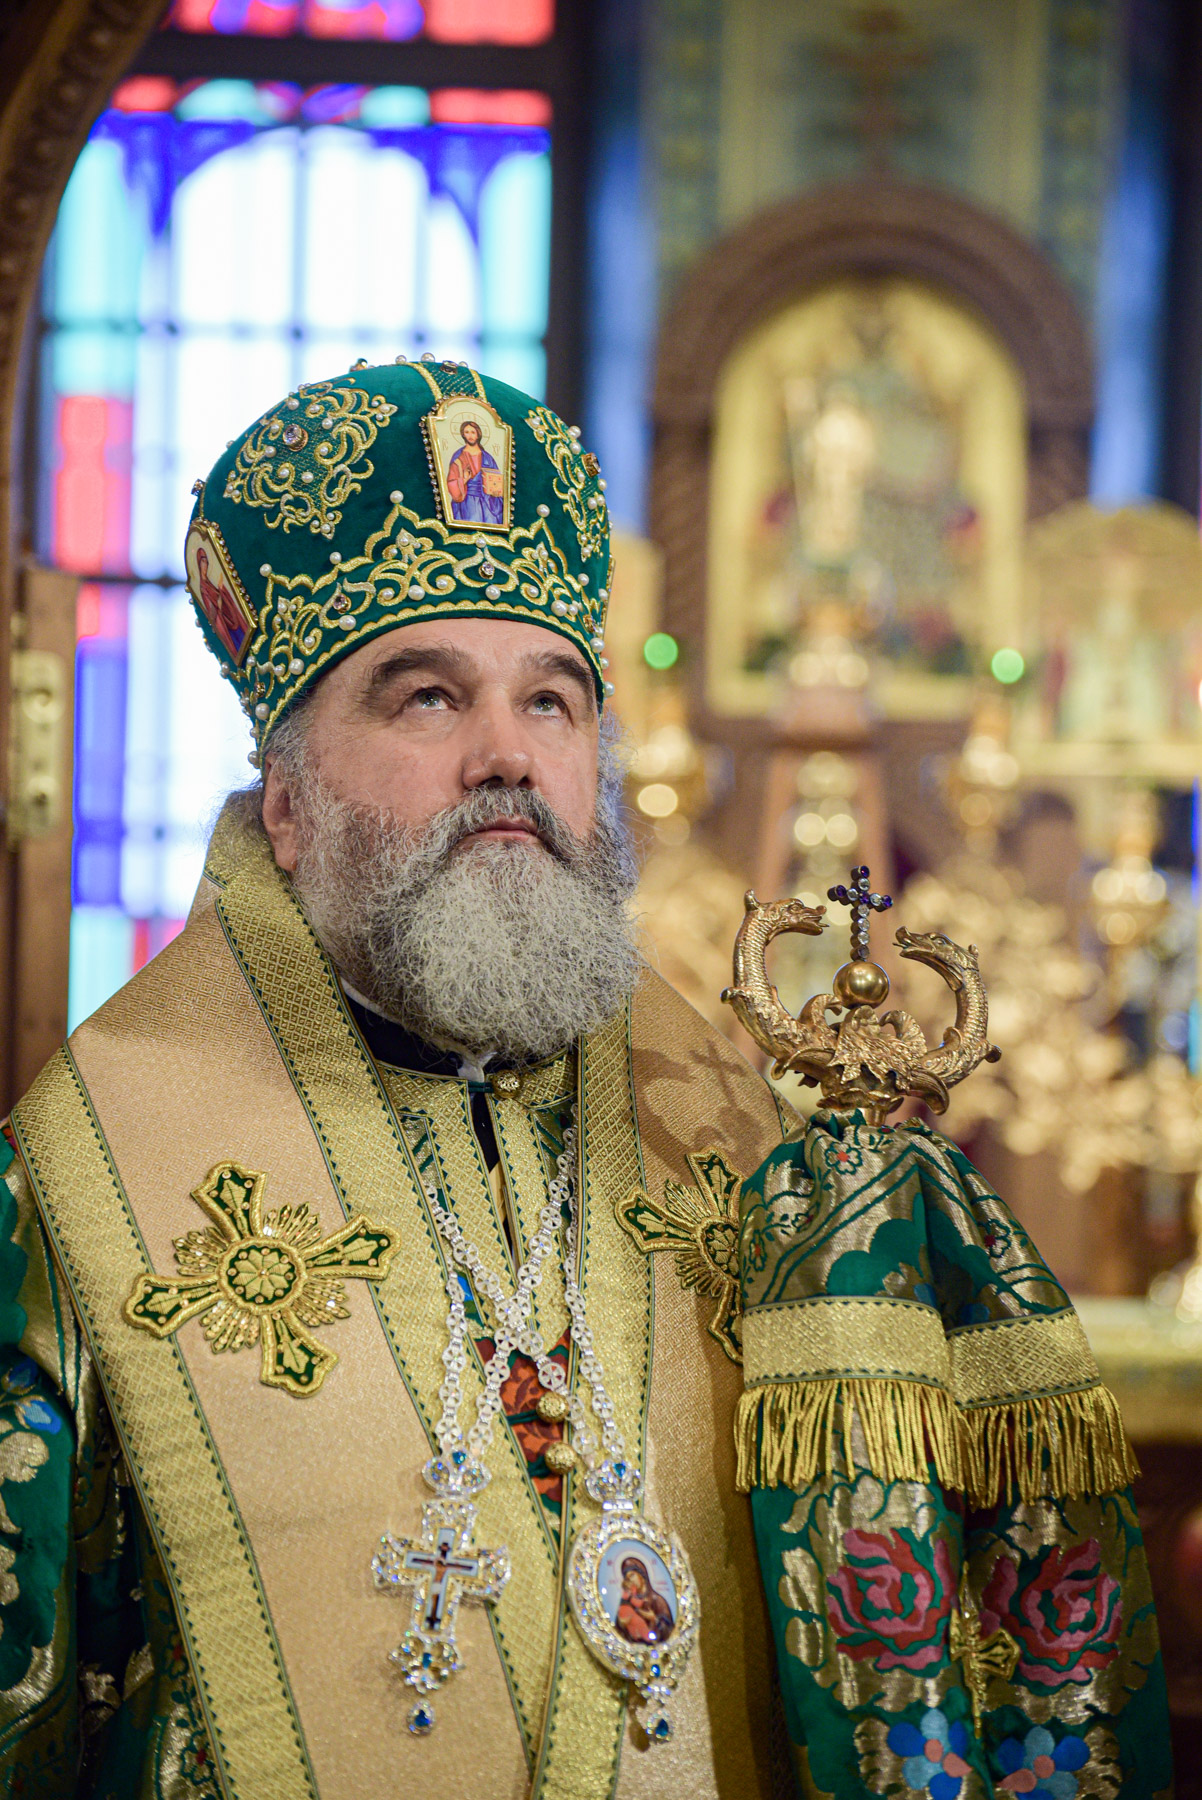 photos of orthodox christmas 0266 1